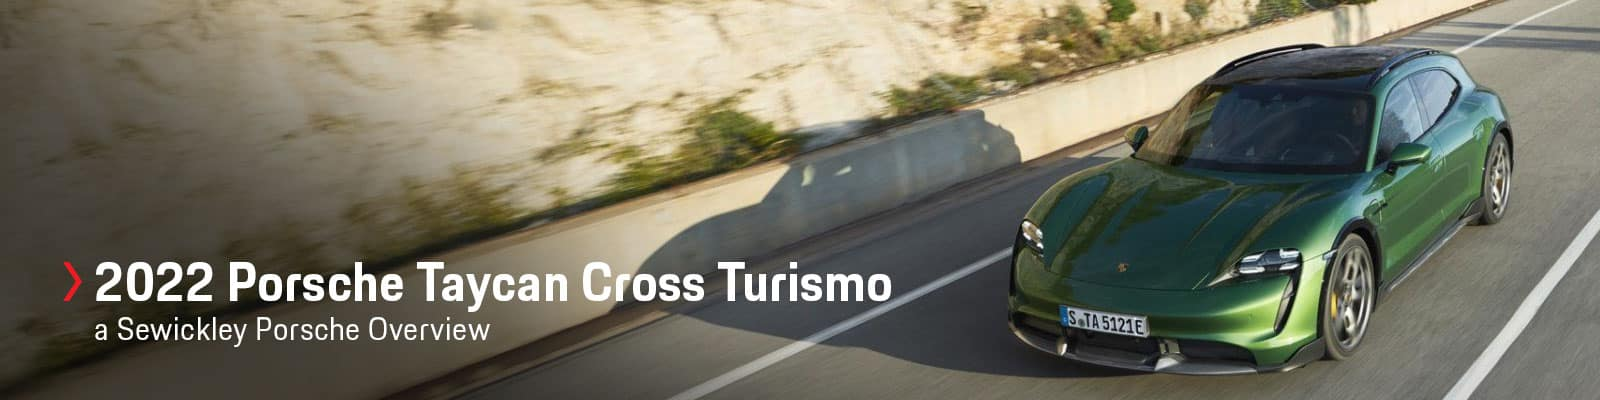 2022 Porsche Taycan Cross Turismo Model Review